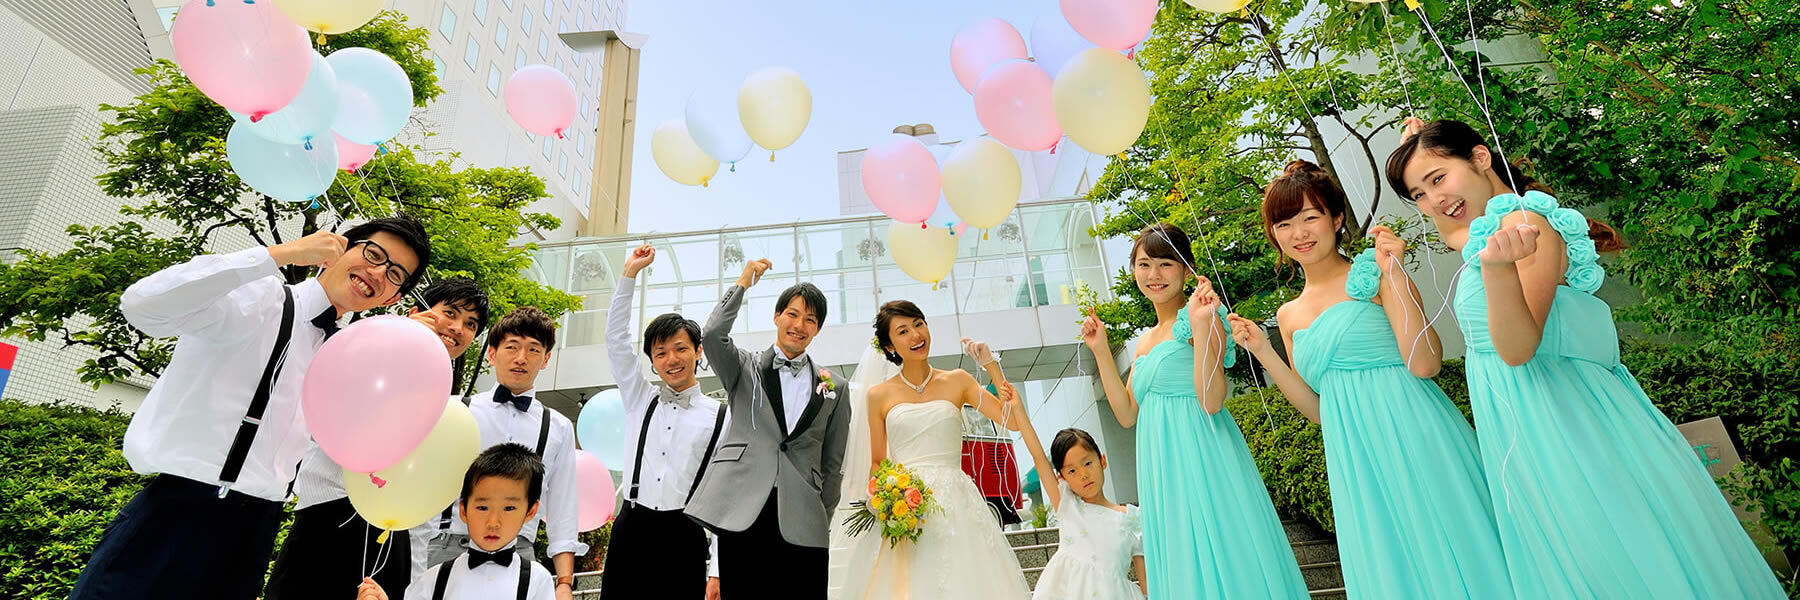 Reiwa恋プラン|ウエディングプラン|レンブラントホテル海老名(旧オークラフロンティアホテル海老名)【公式】婚礼サイト